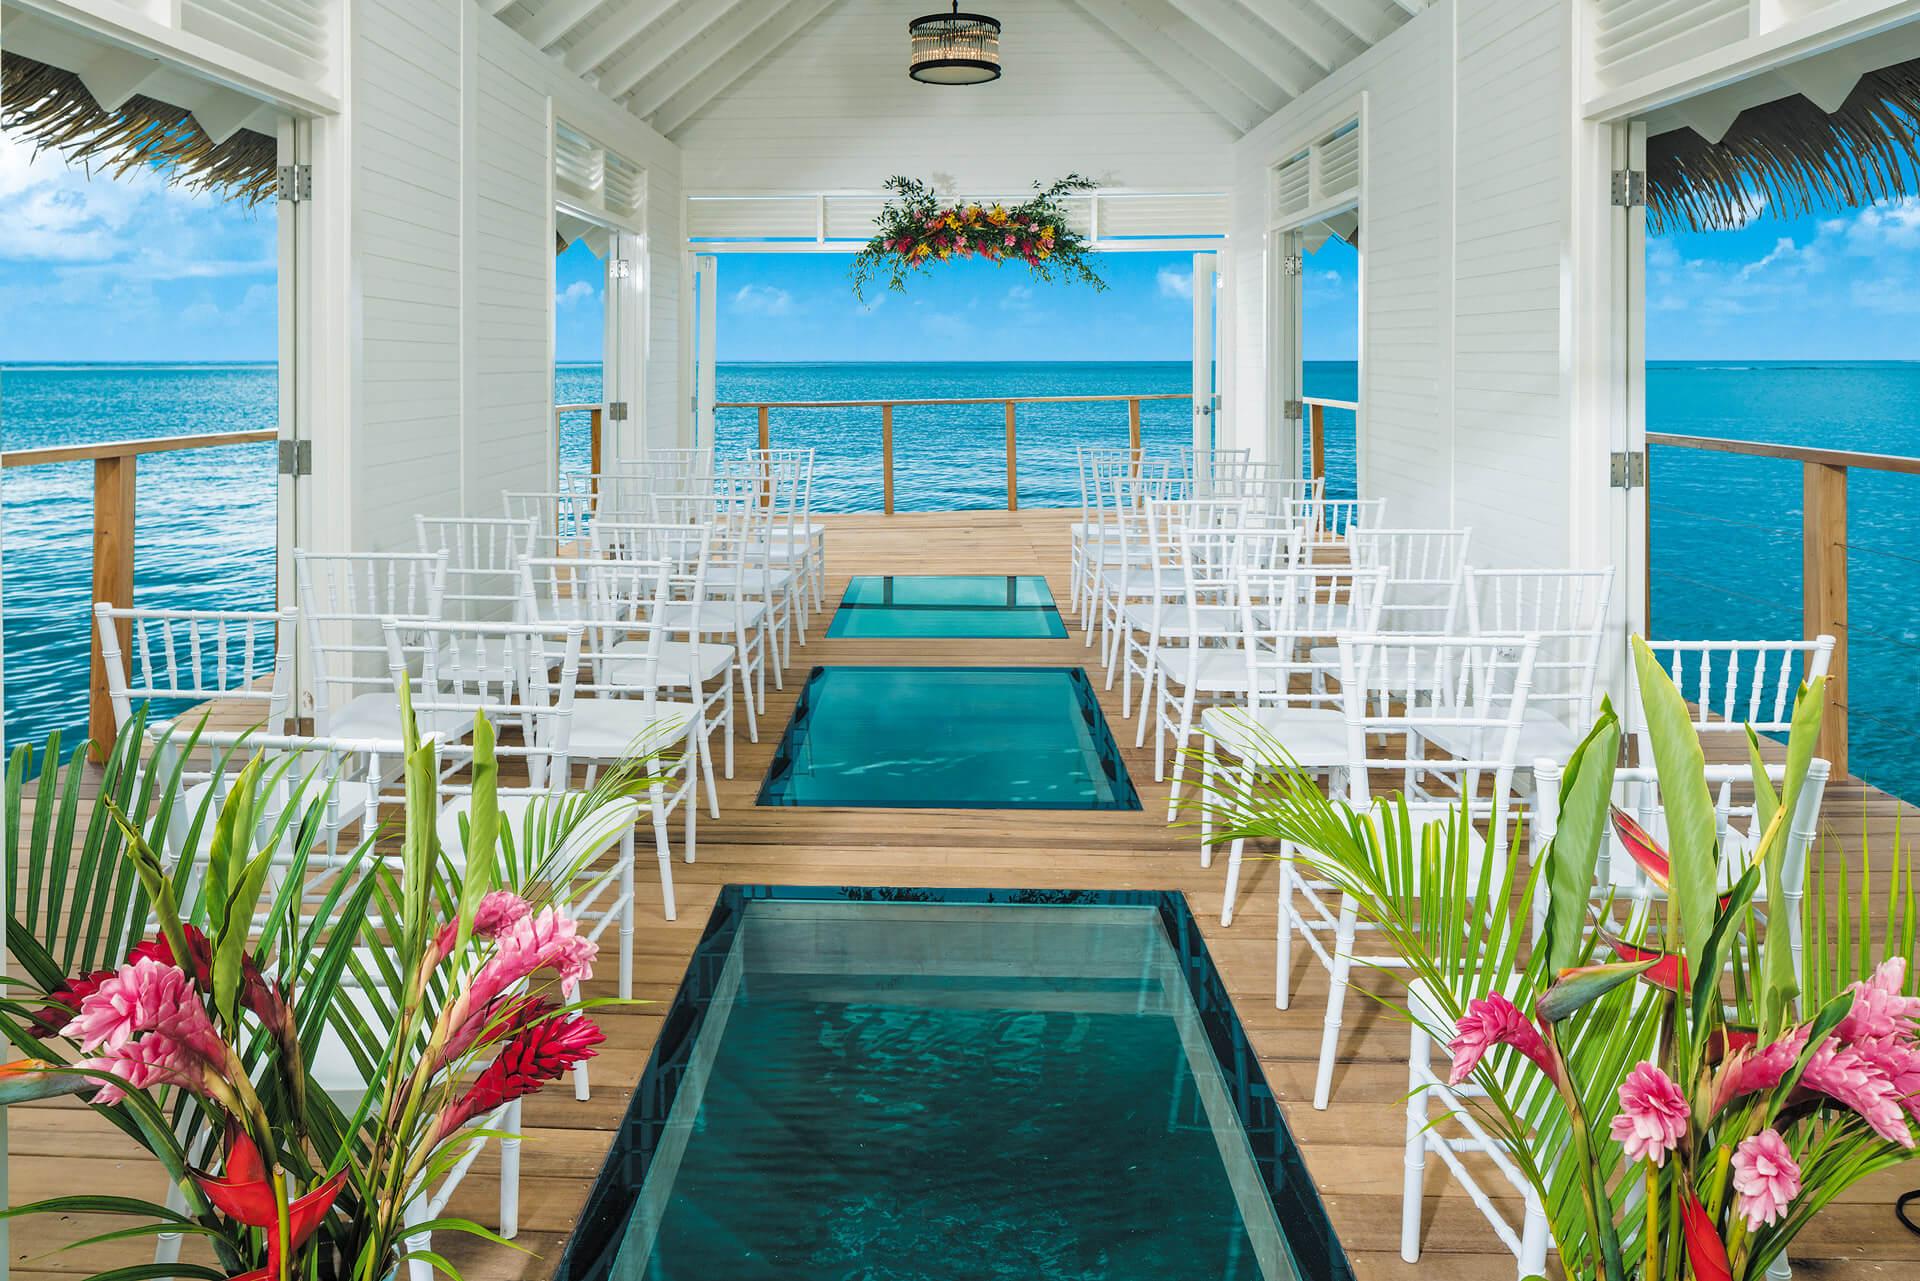 Sandals Whitehouse, Jamaica 2015   Travel dreams, Tourism